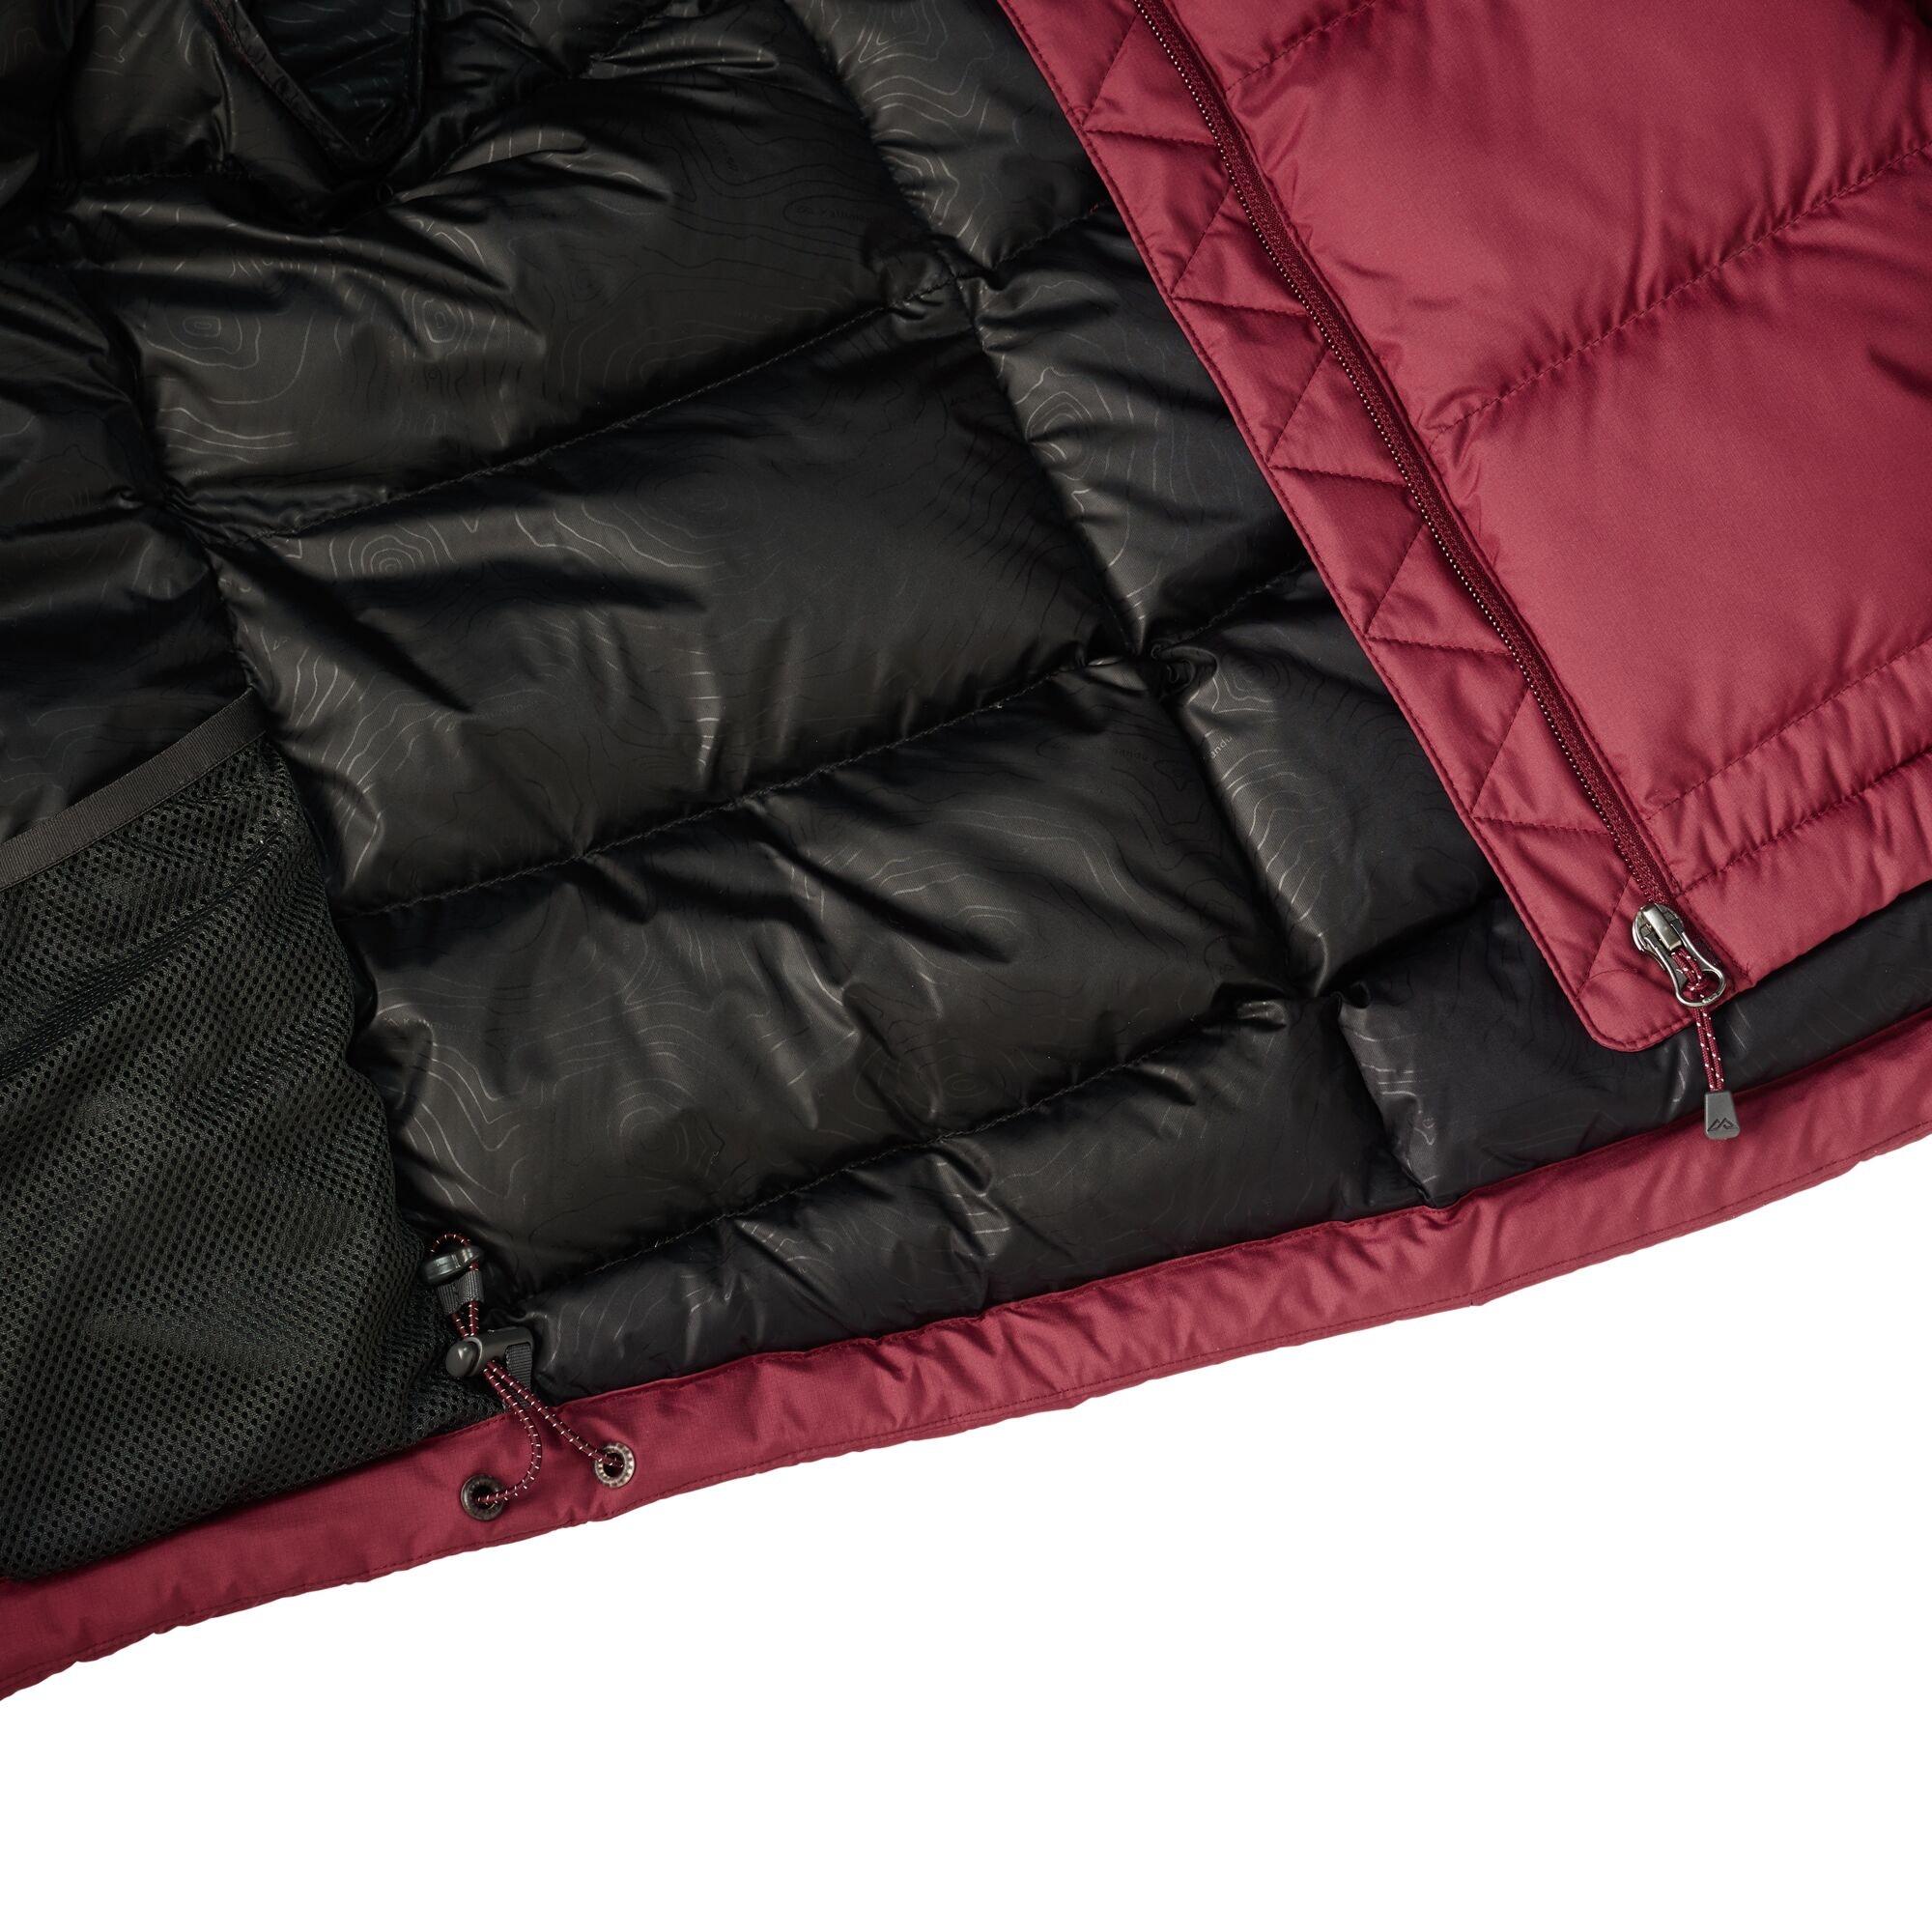 thumbnail 36 - NEW Kathmandu Epiq Womens Hooded Down Puffer 600 Fill Warm Outdoor Winter Jacket